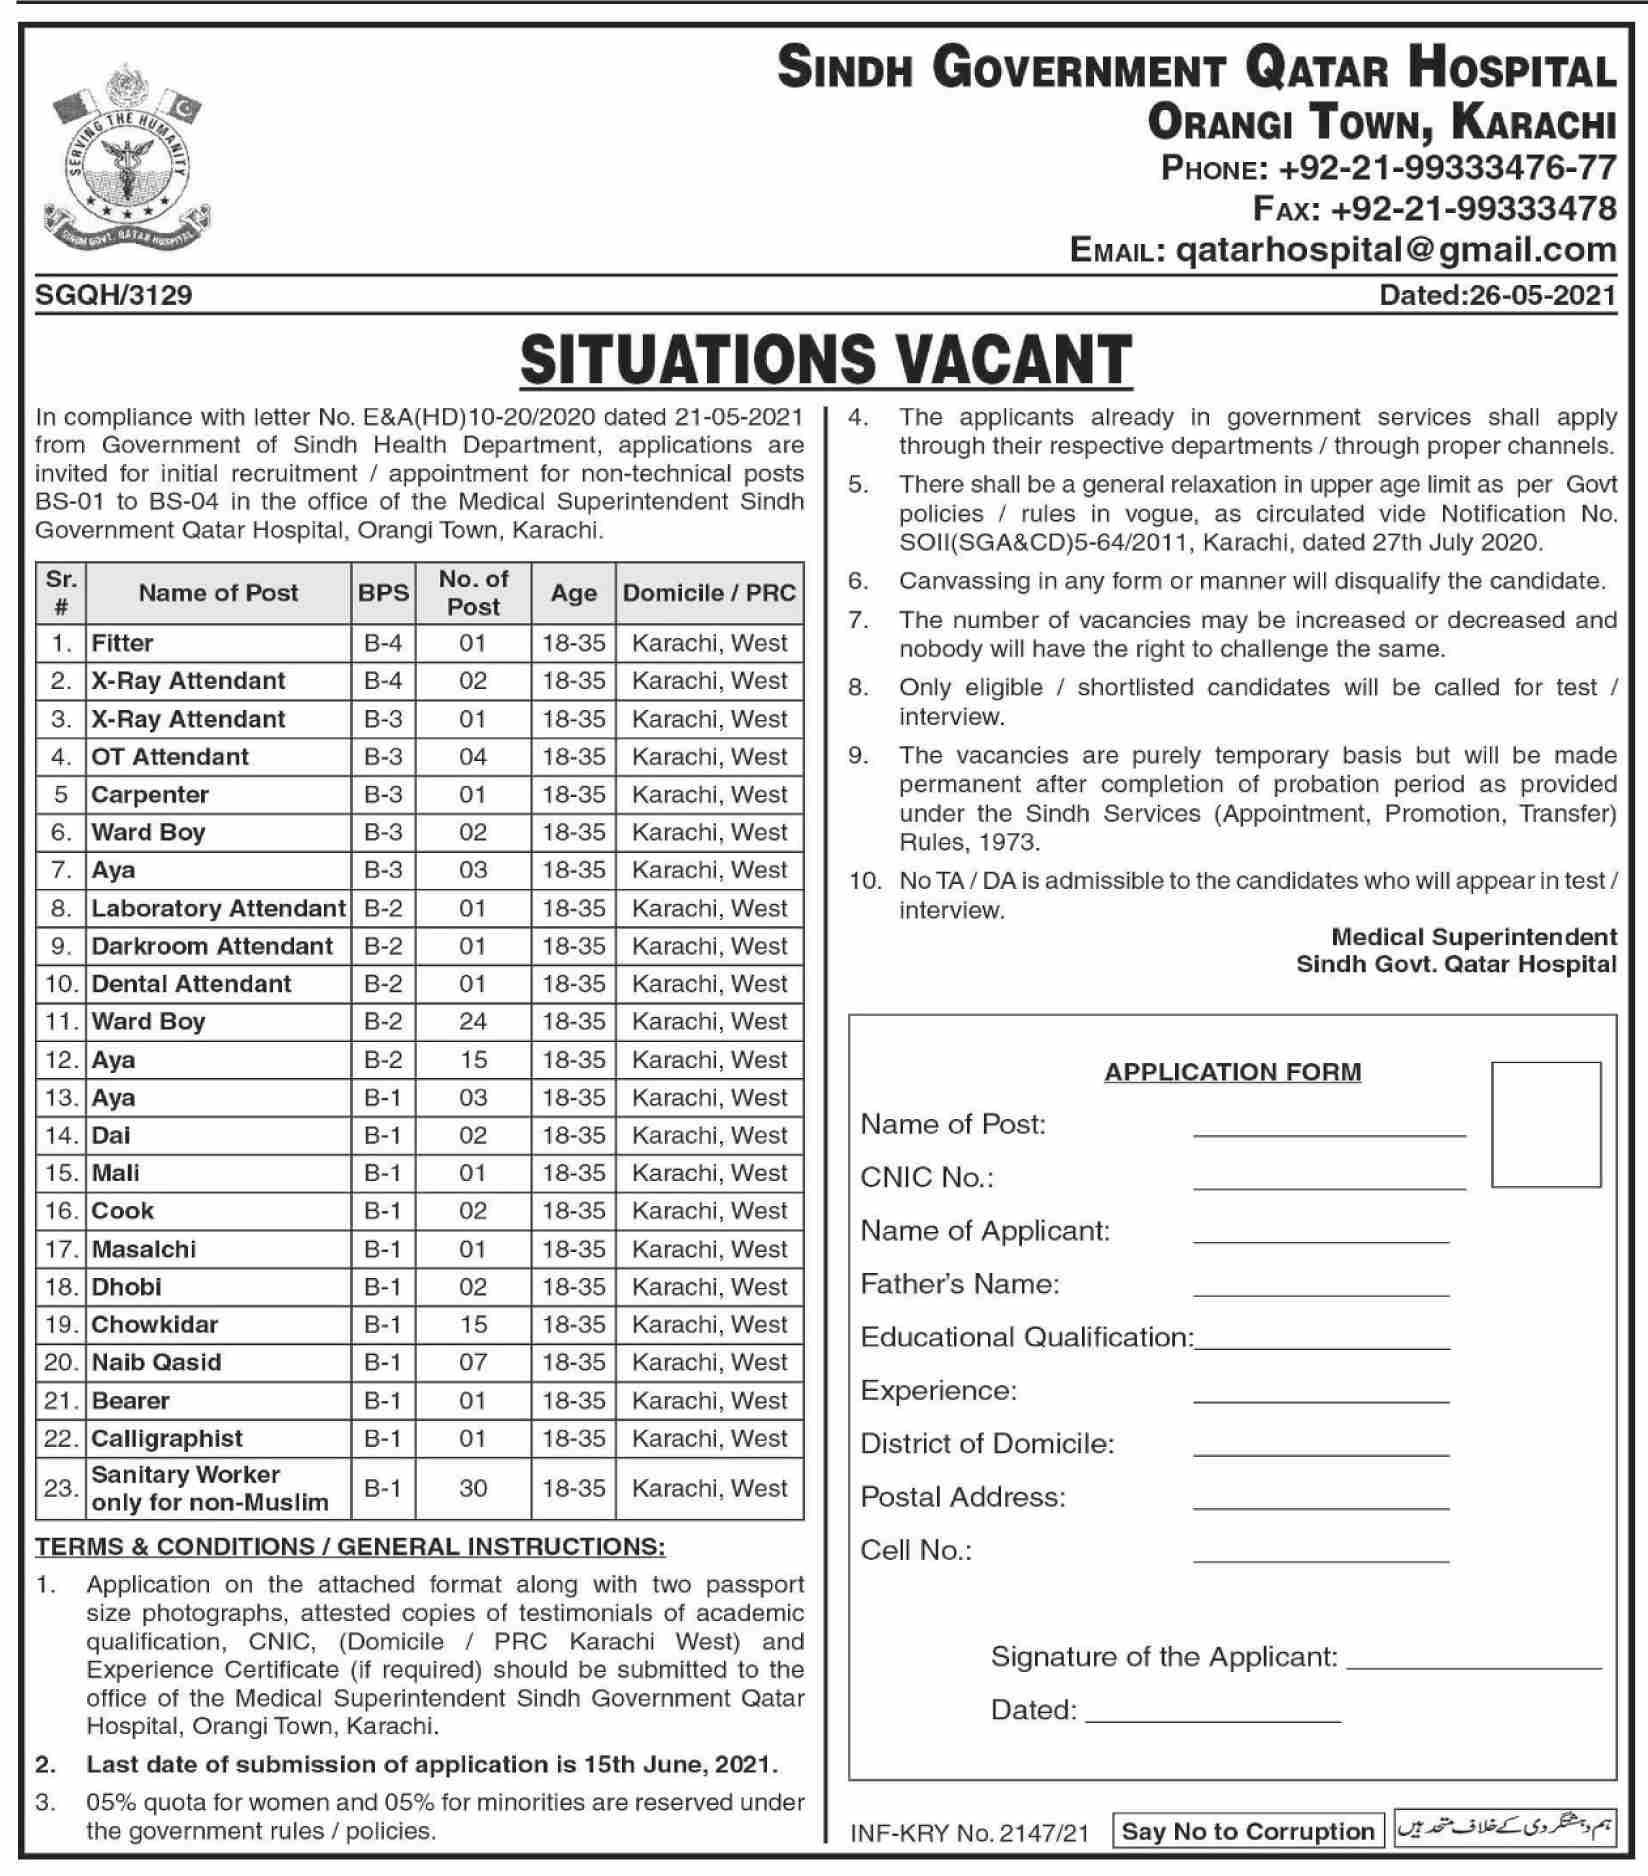 Sindh Government Qatar Hospital Jobs 2021 (120 Posts)